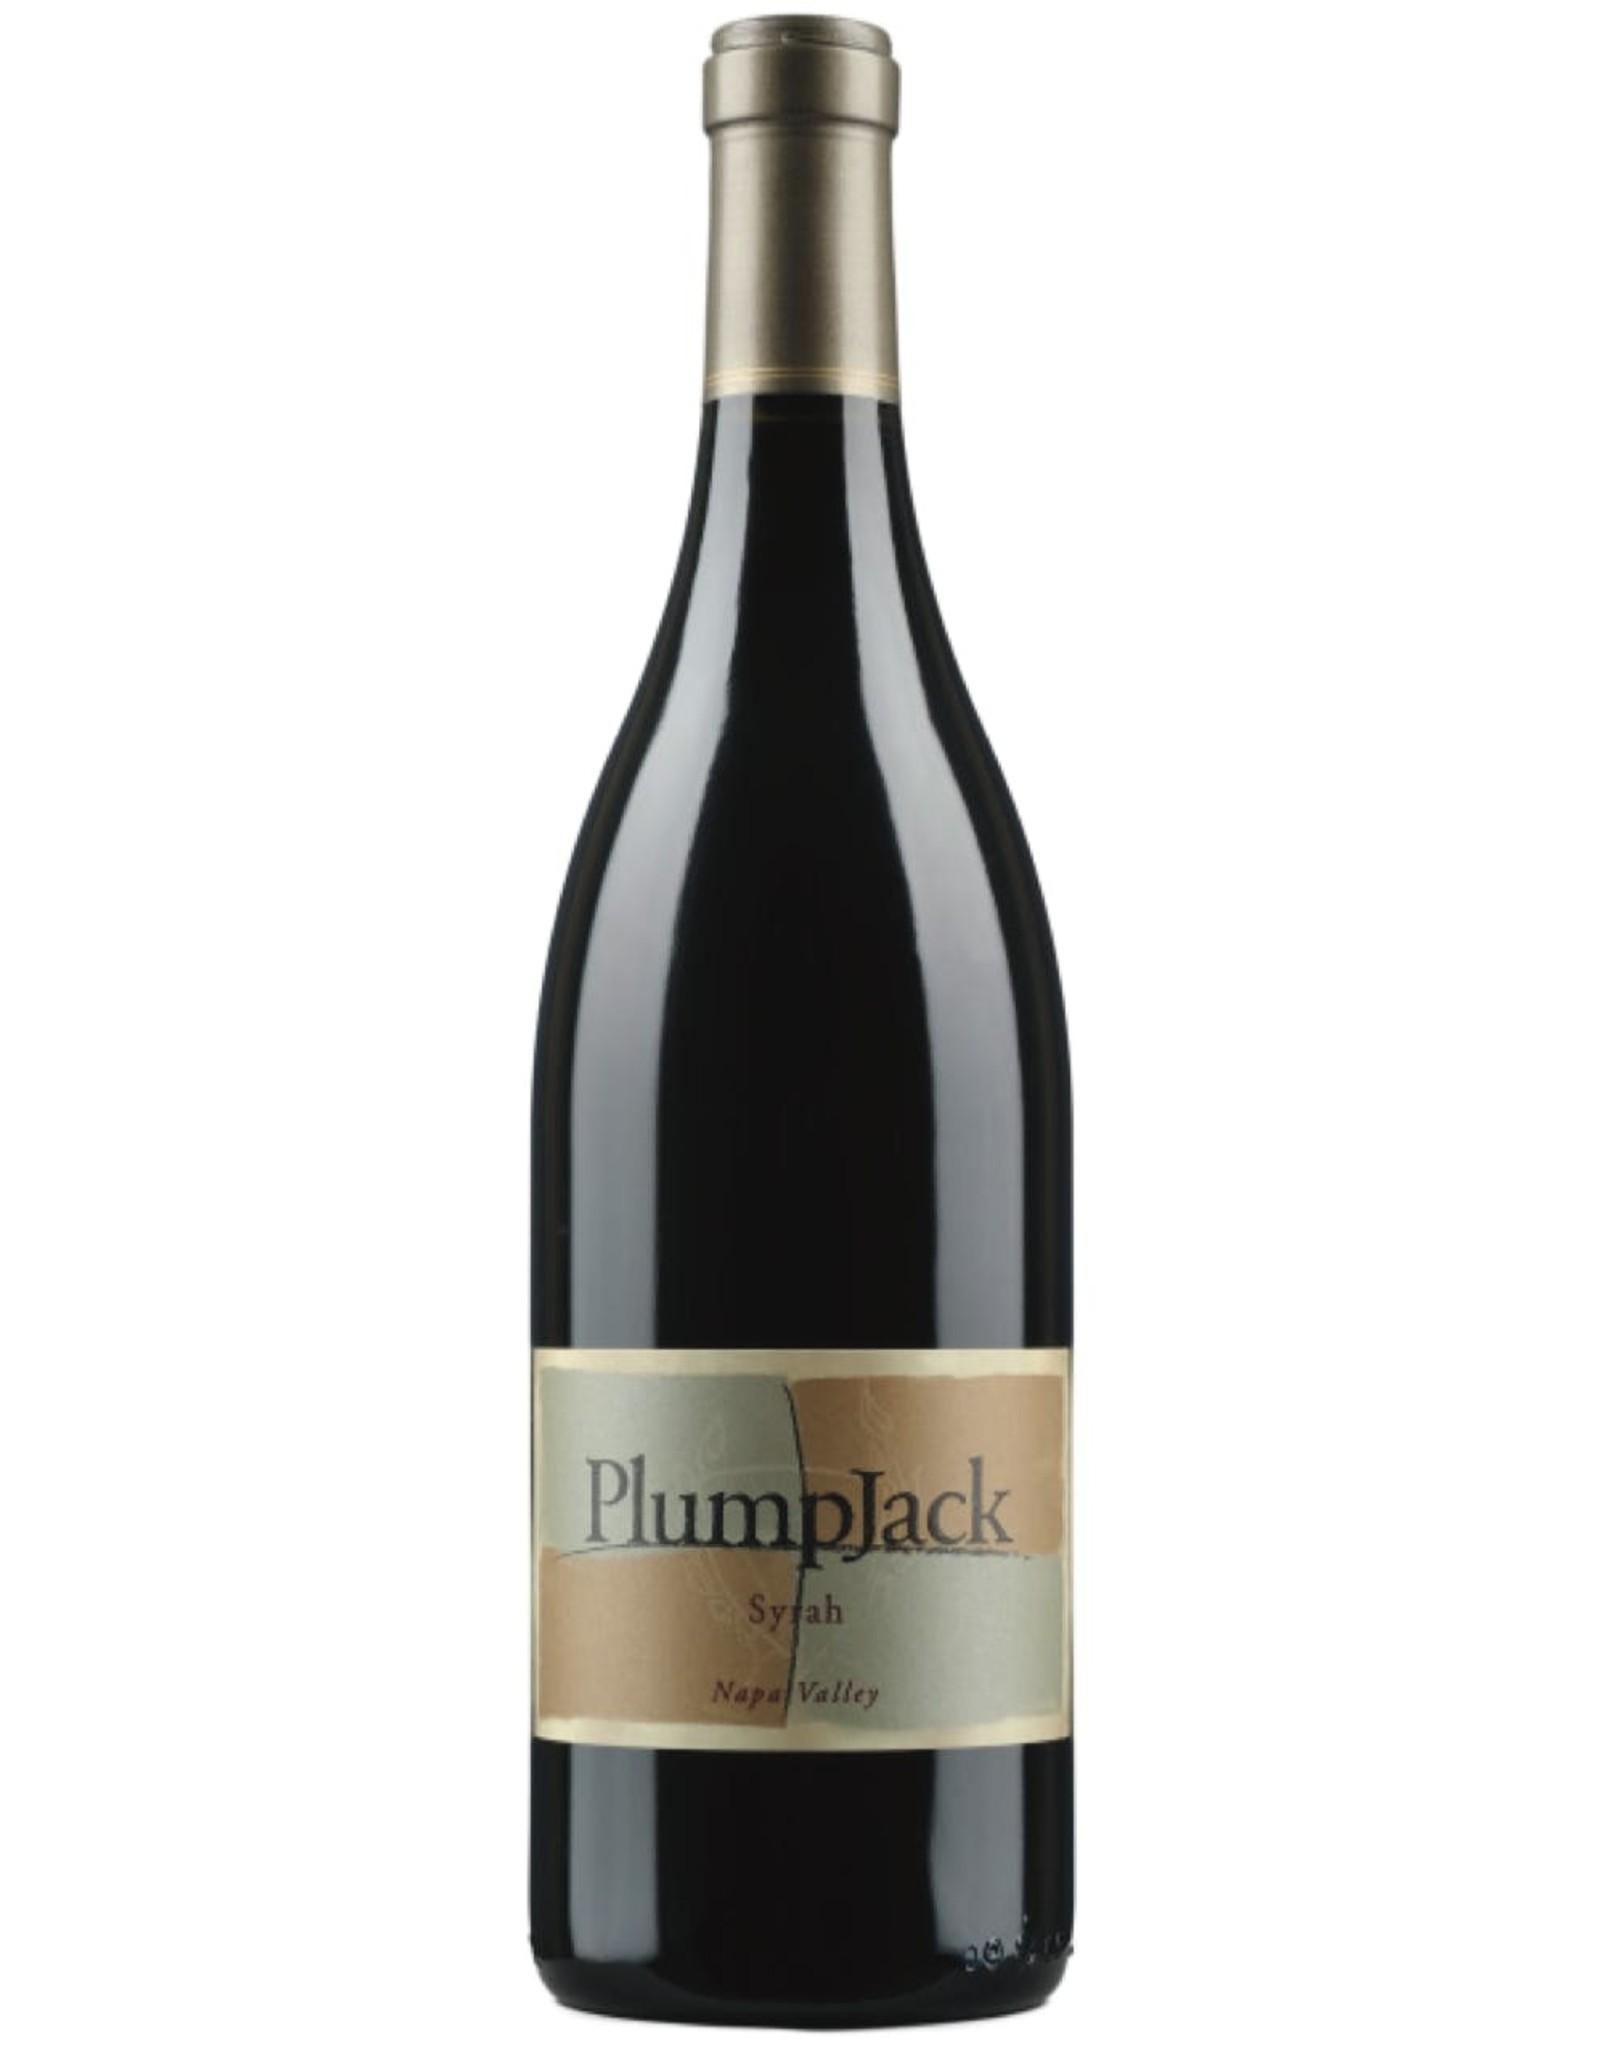 Plumpjack Syrah 2018